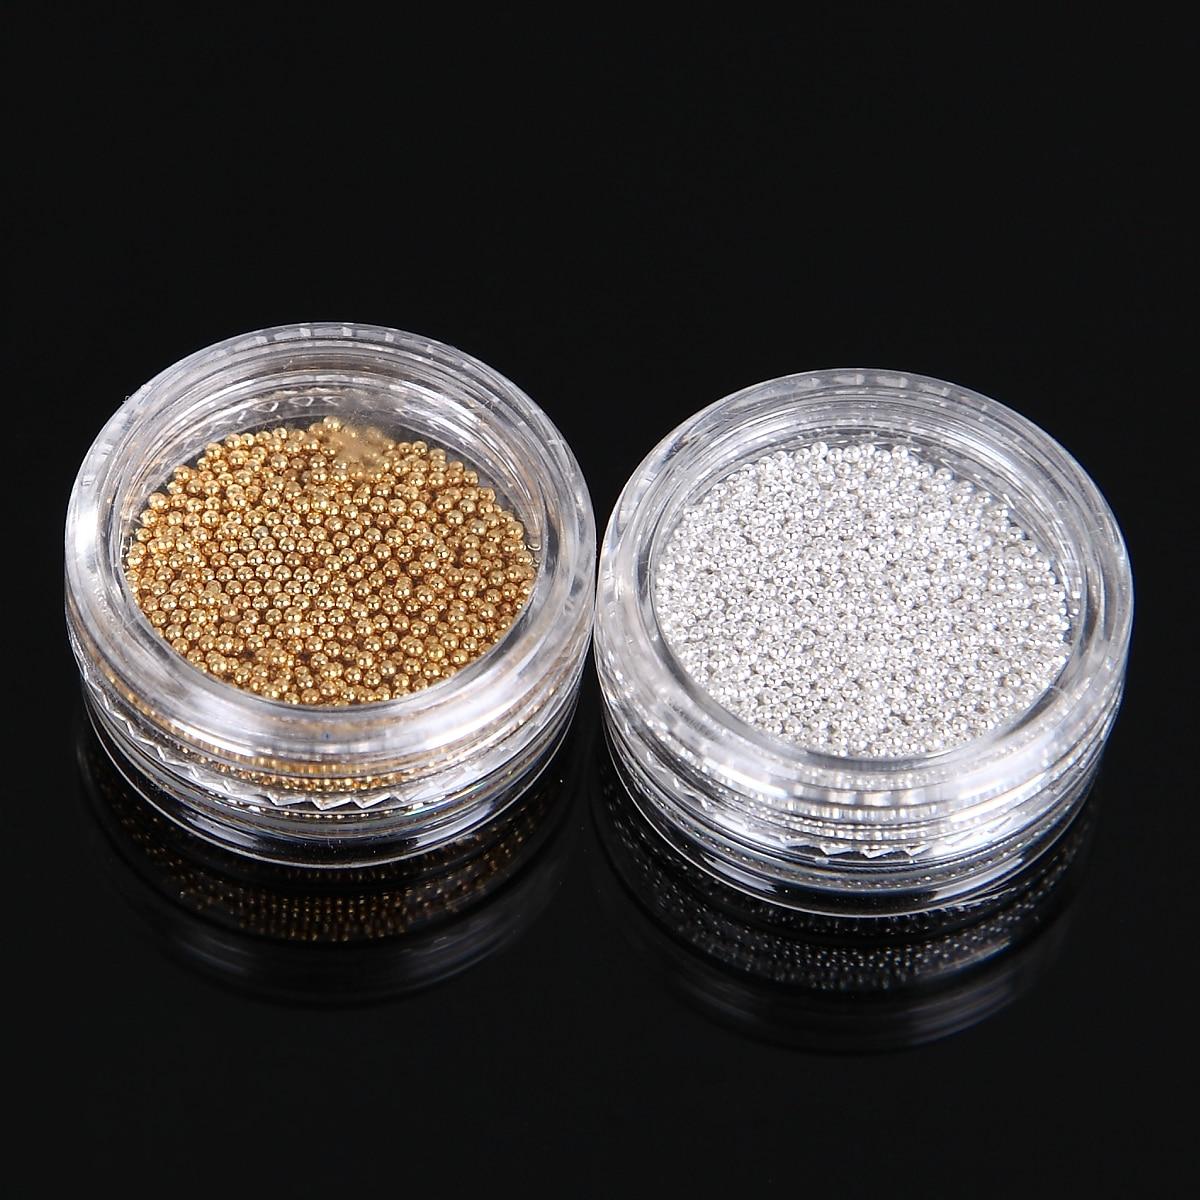 Monja 10g / kutija 1mm zlatna srebrna noktiju metal metal perle od - Manikura - Foto 6